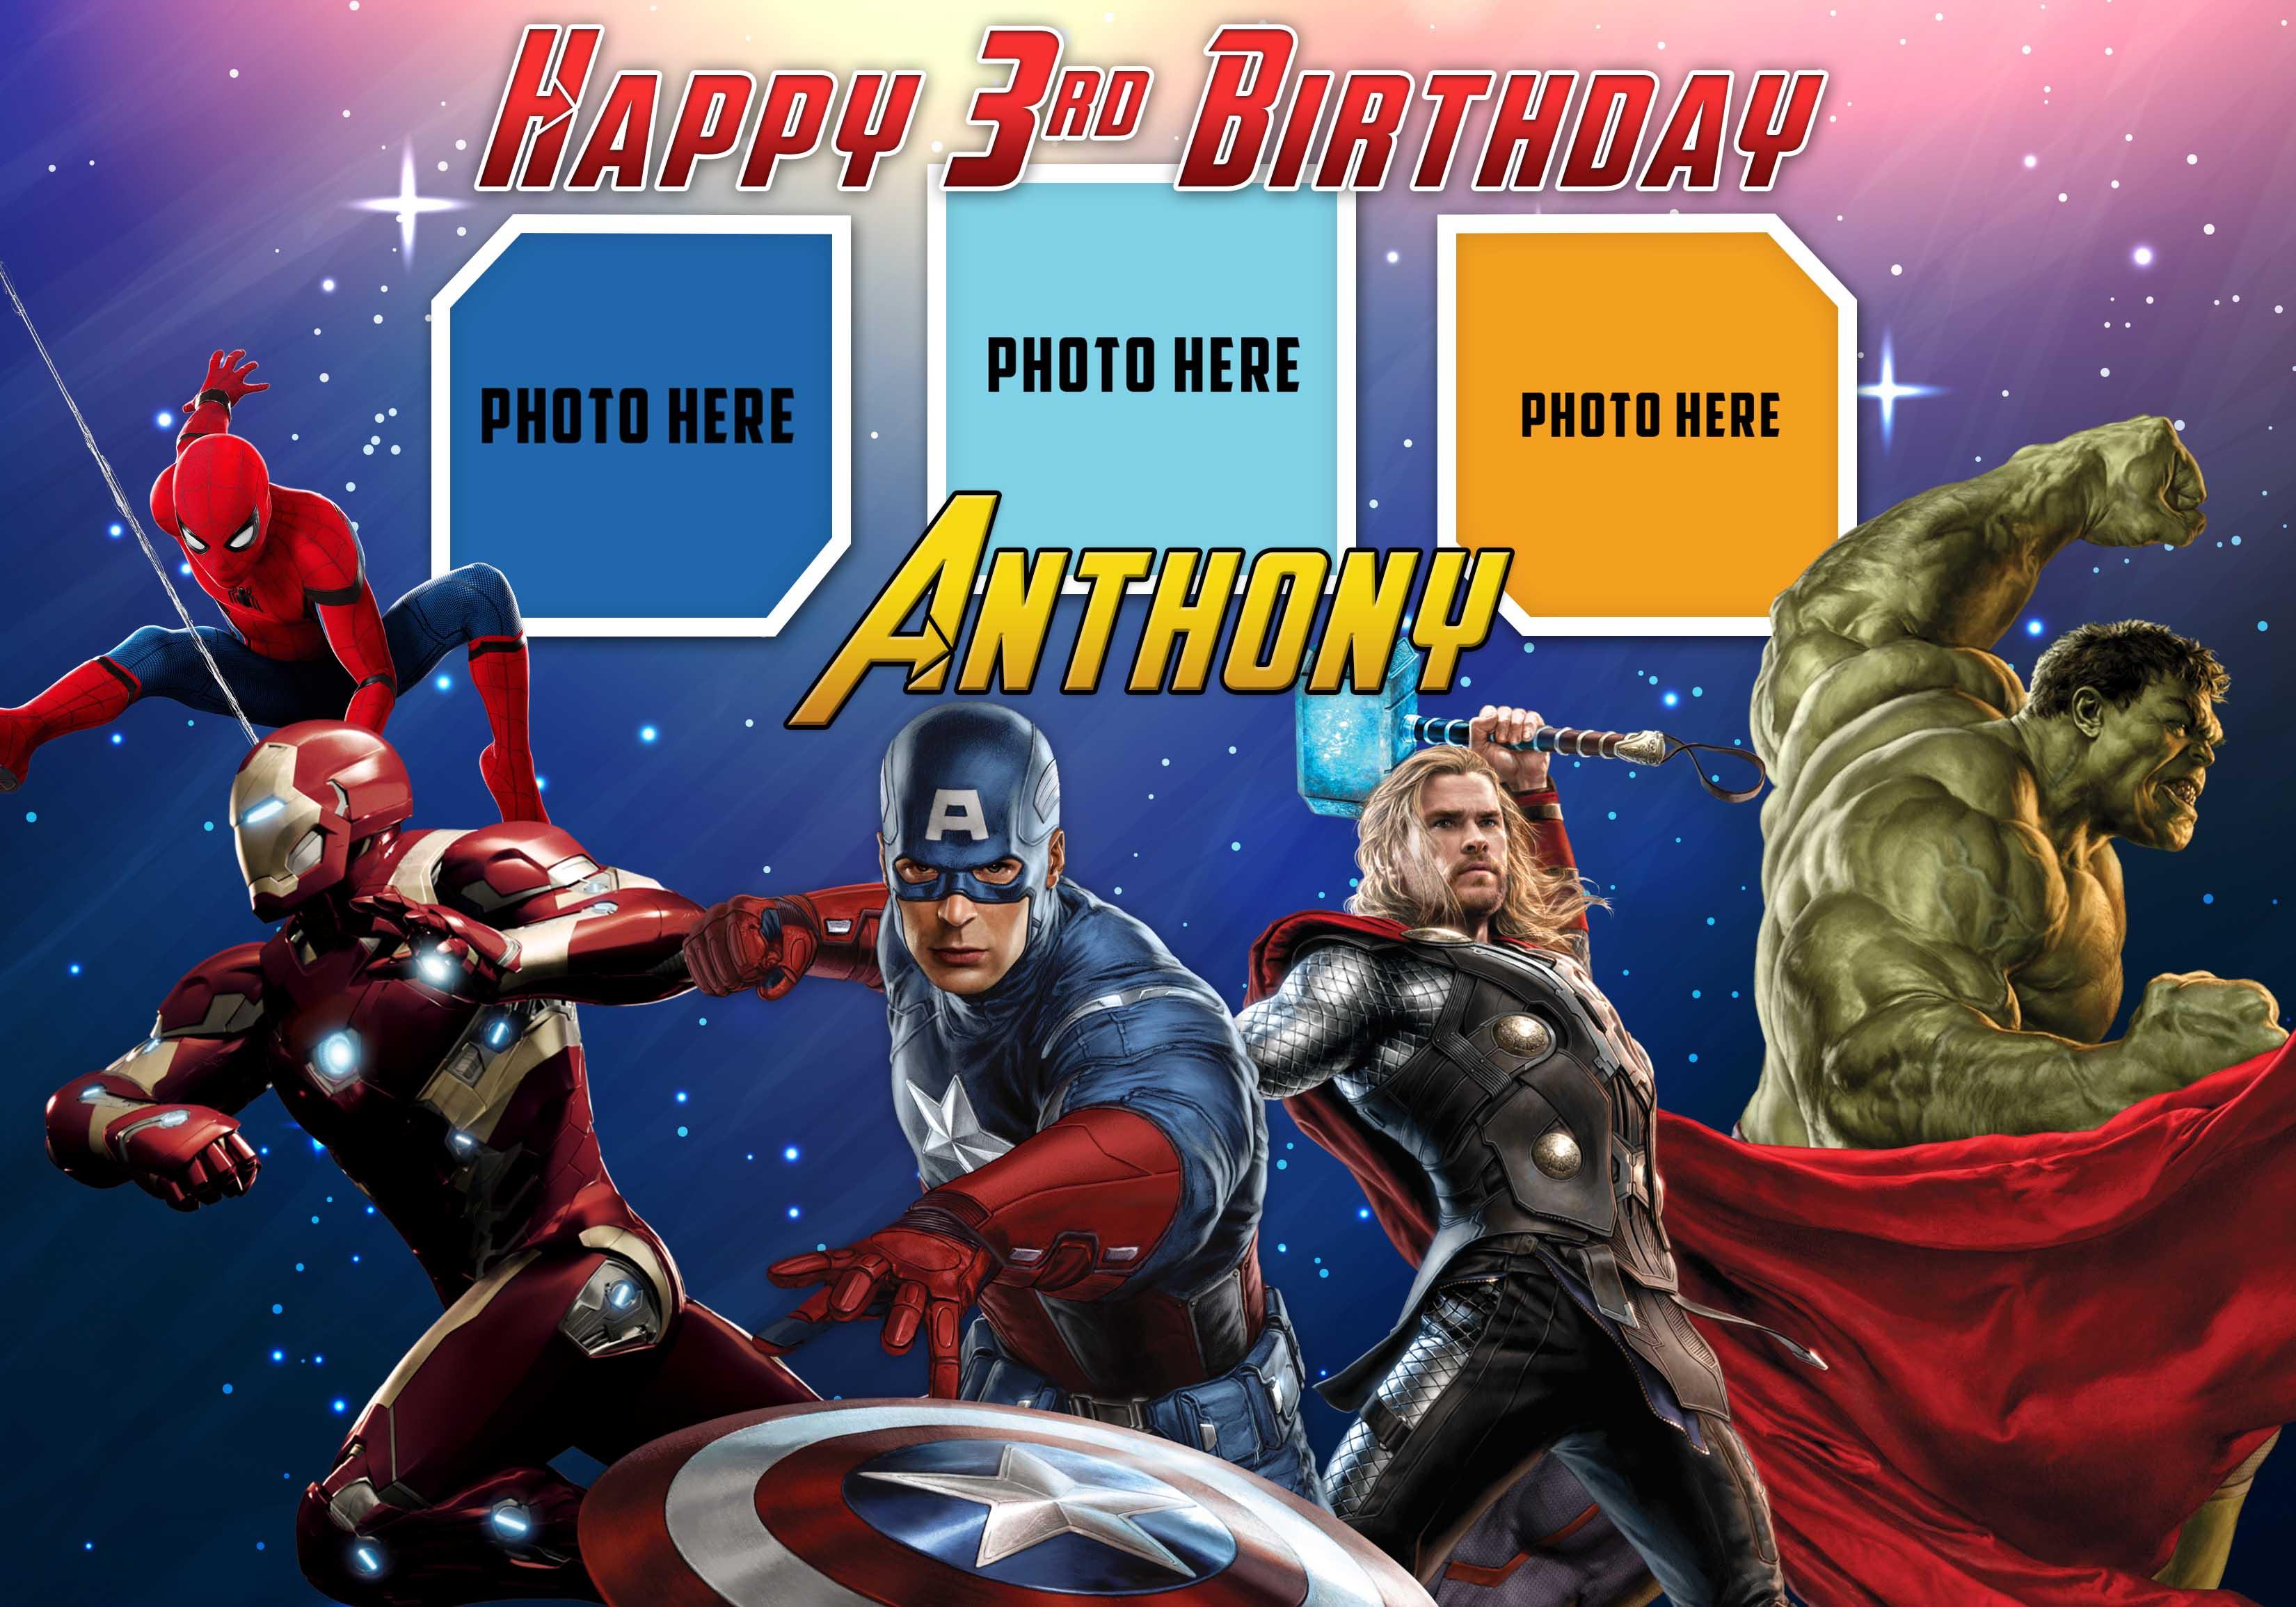 Avengers Birthday Tarpaulin Template Dioskouri Designs